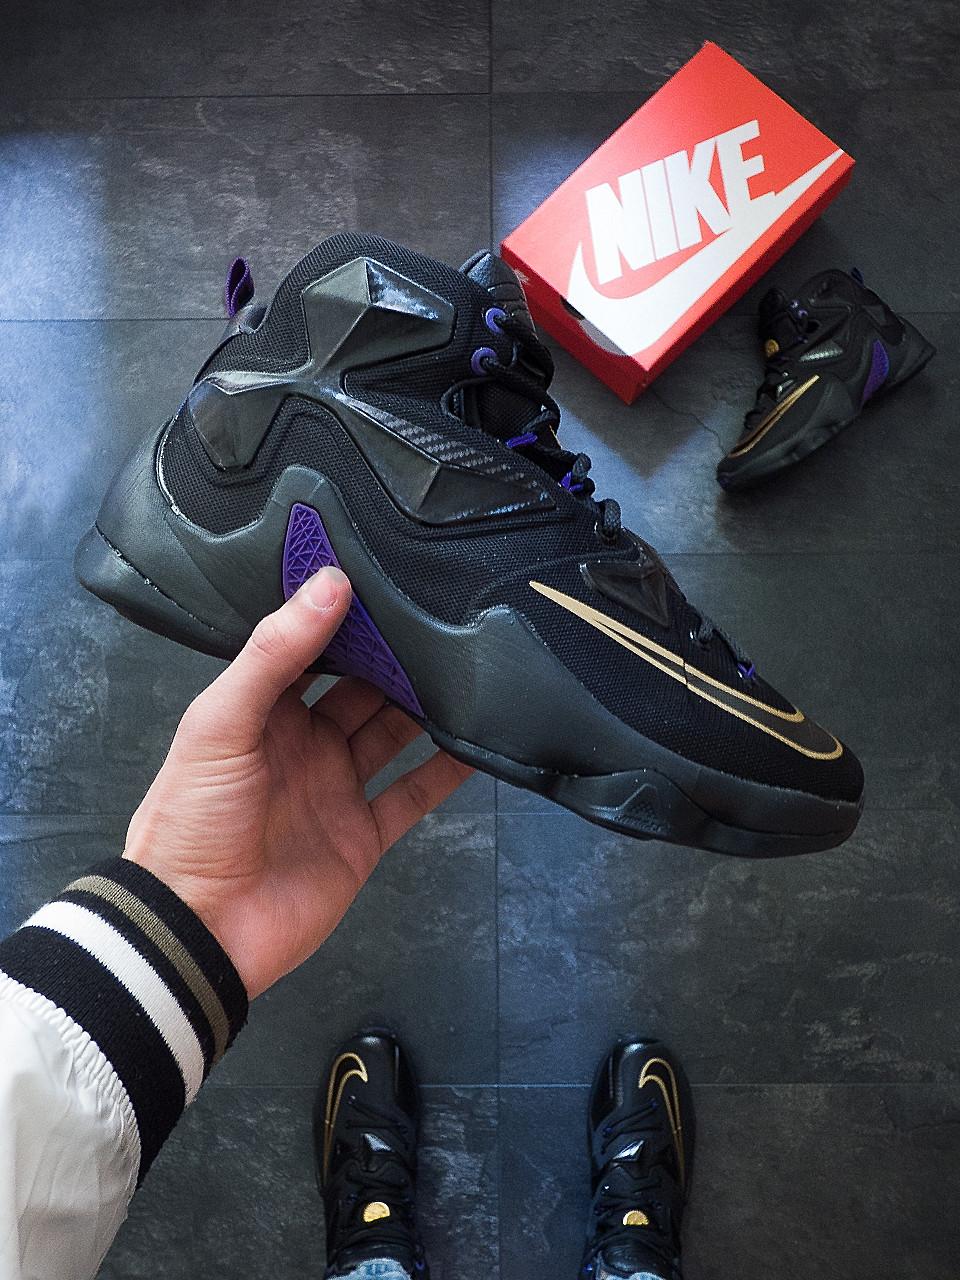 Баскетбольные кроссовки NIKE LEBRON 13 Perfomance